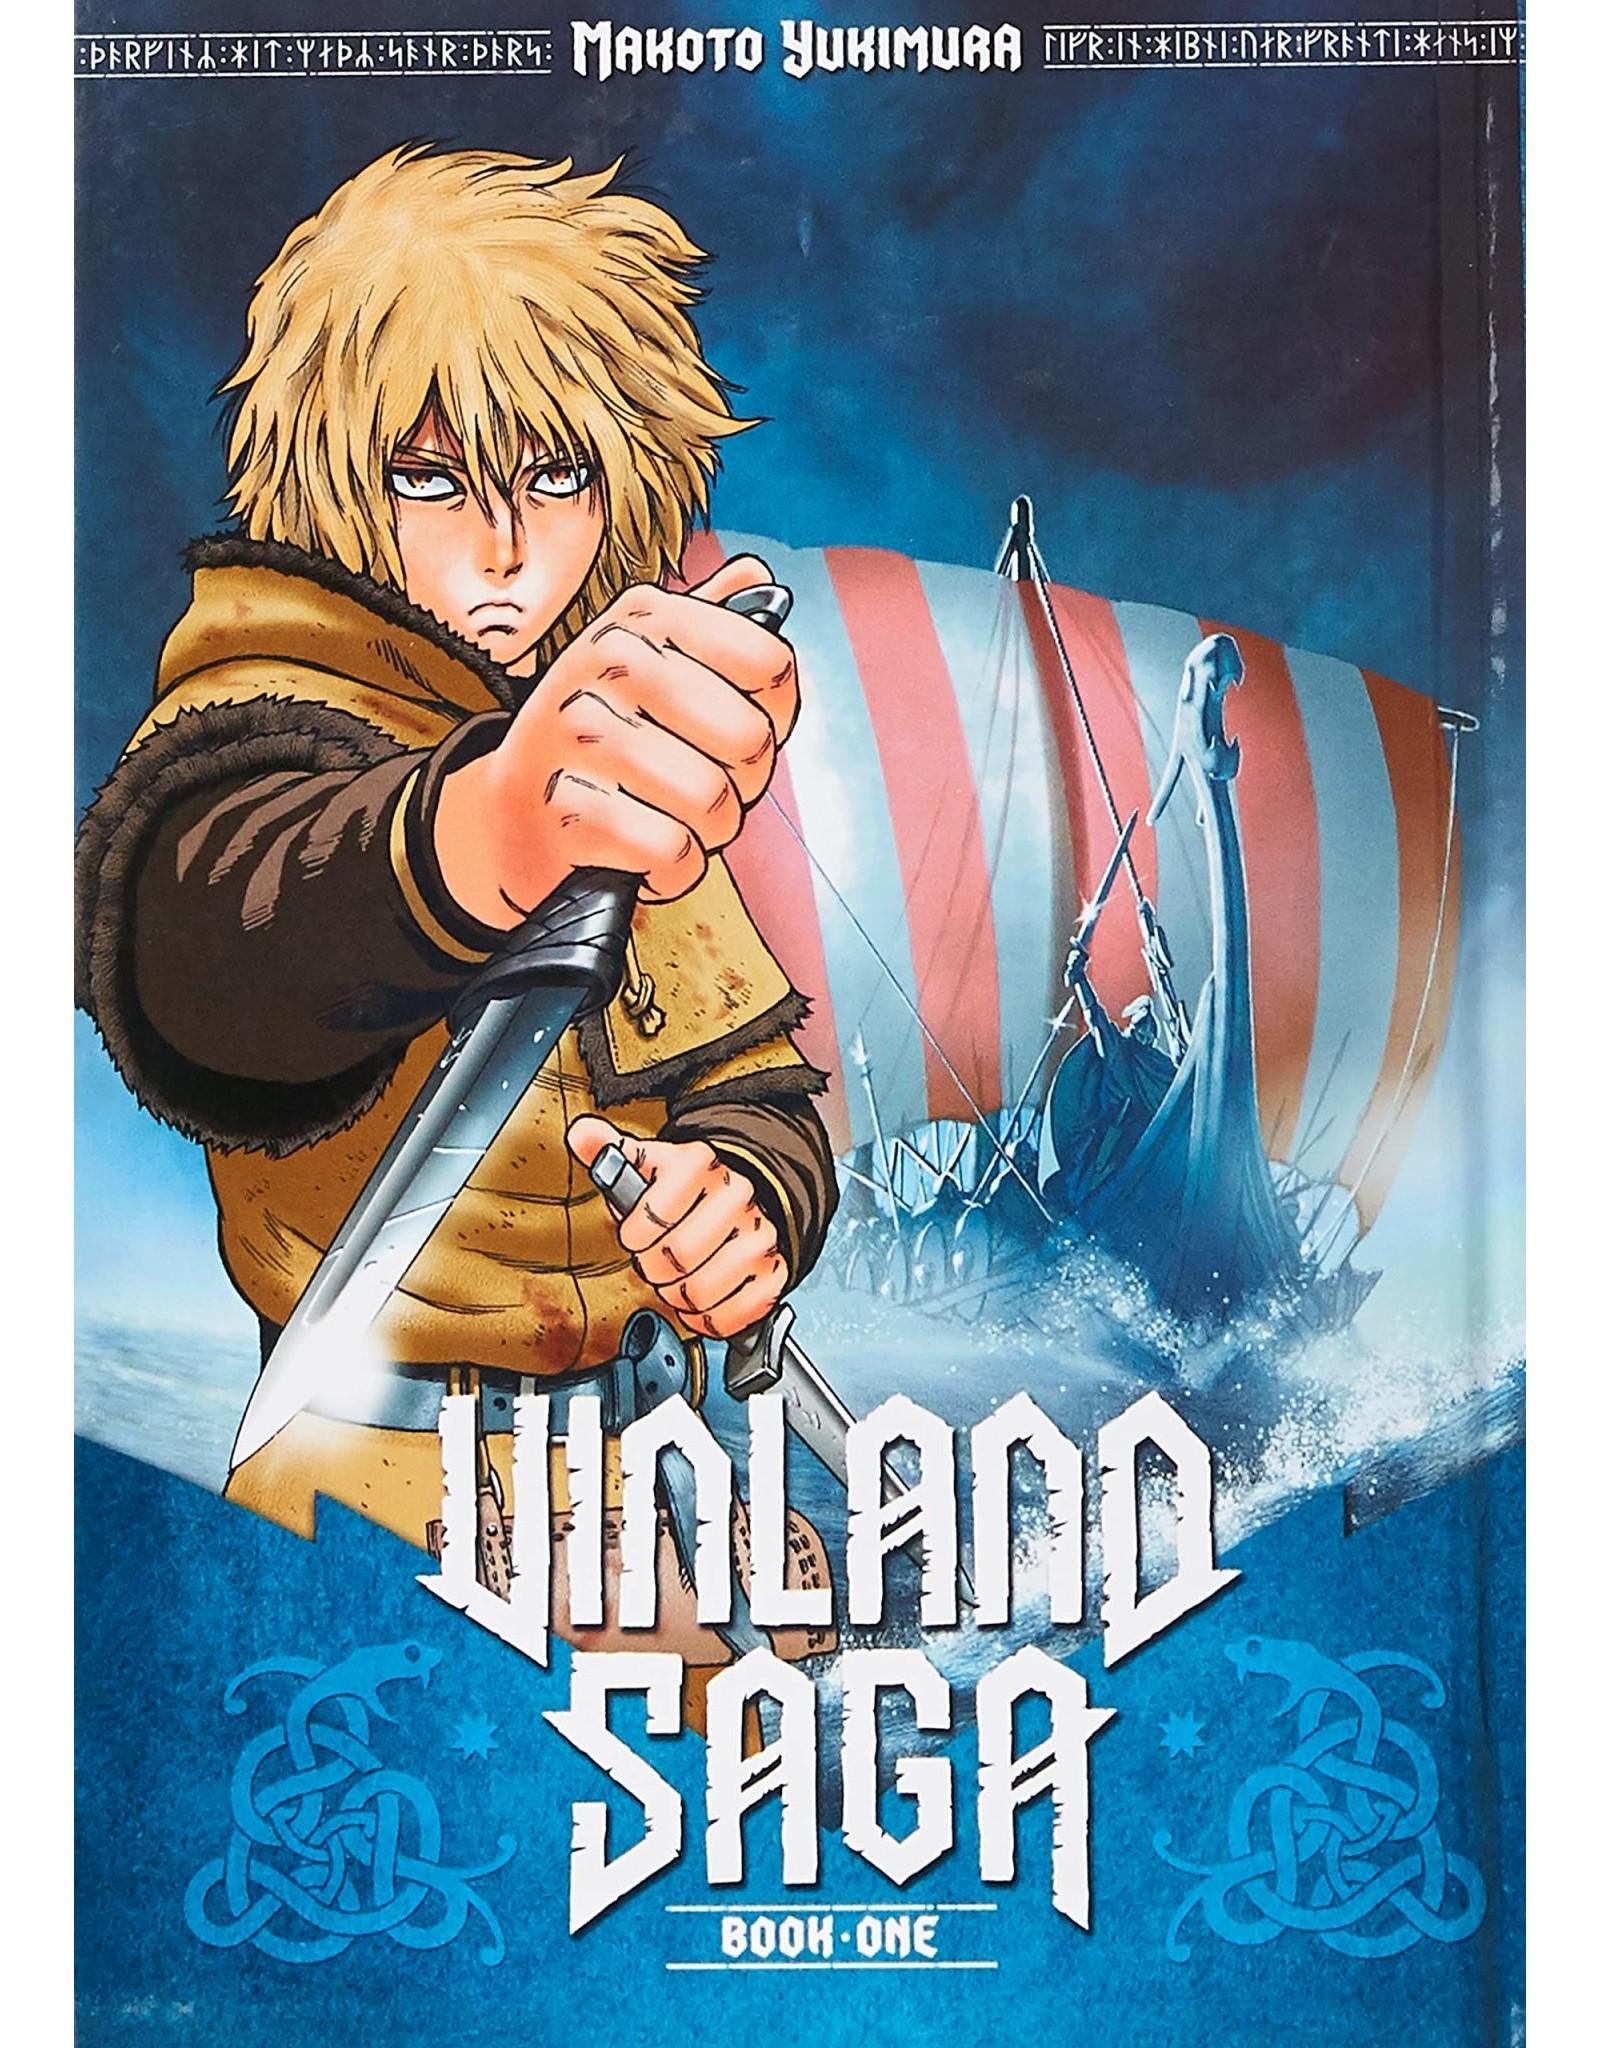 Vinland Saga 1 (Engelstalig) - Hardcover - Manga